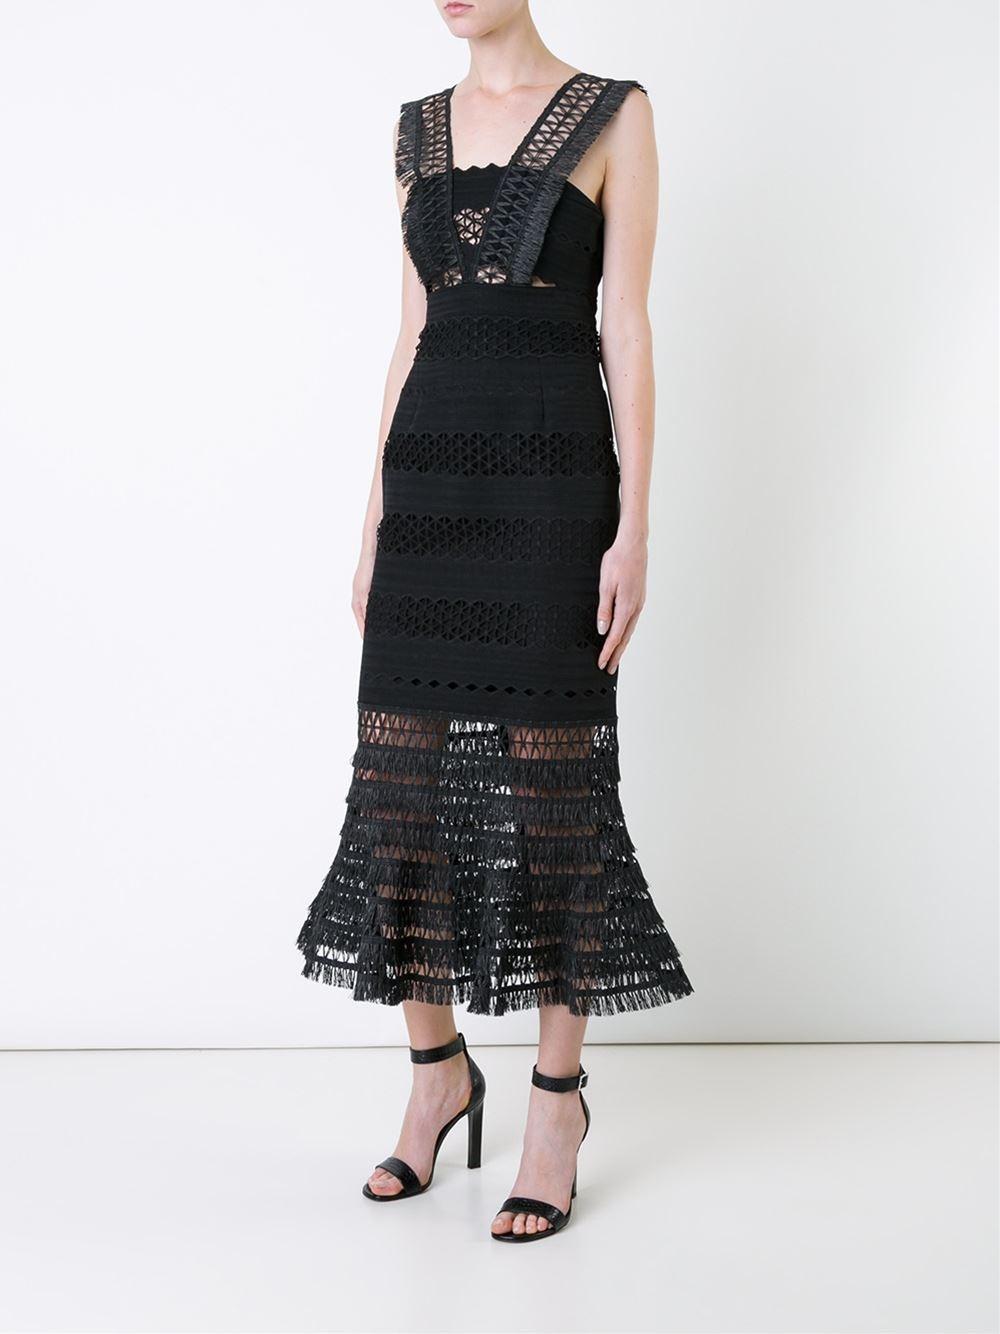 Jonathan Simkhai macramé mermaid skirt dress now $705.18